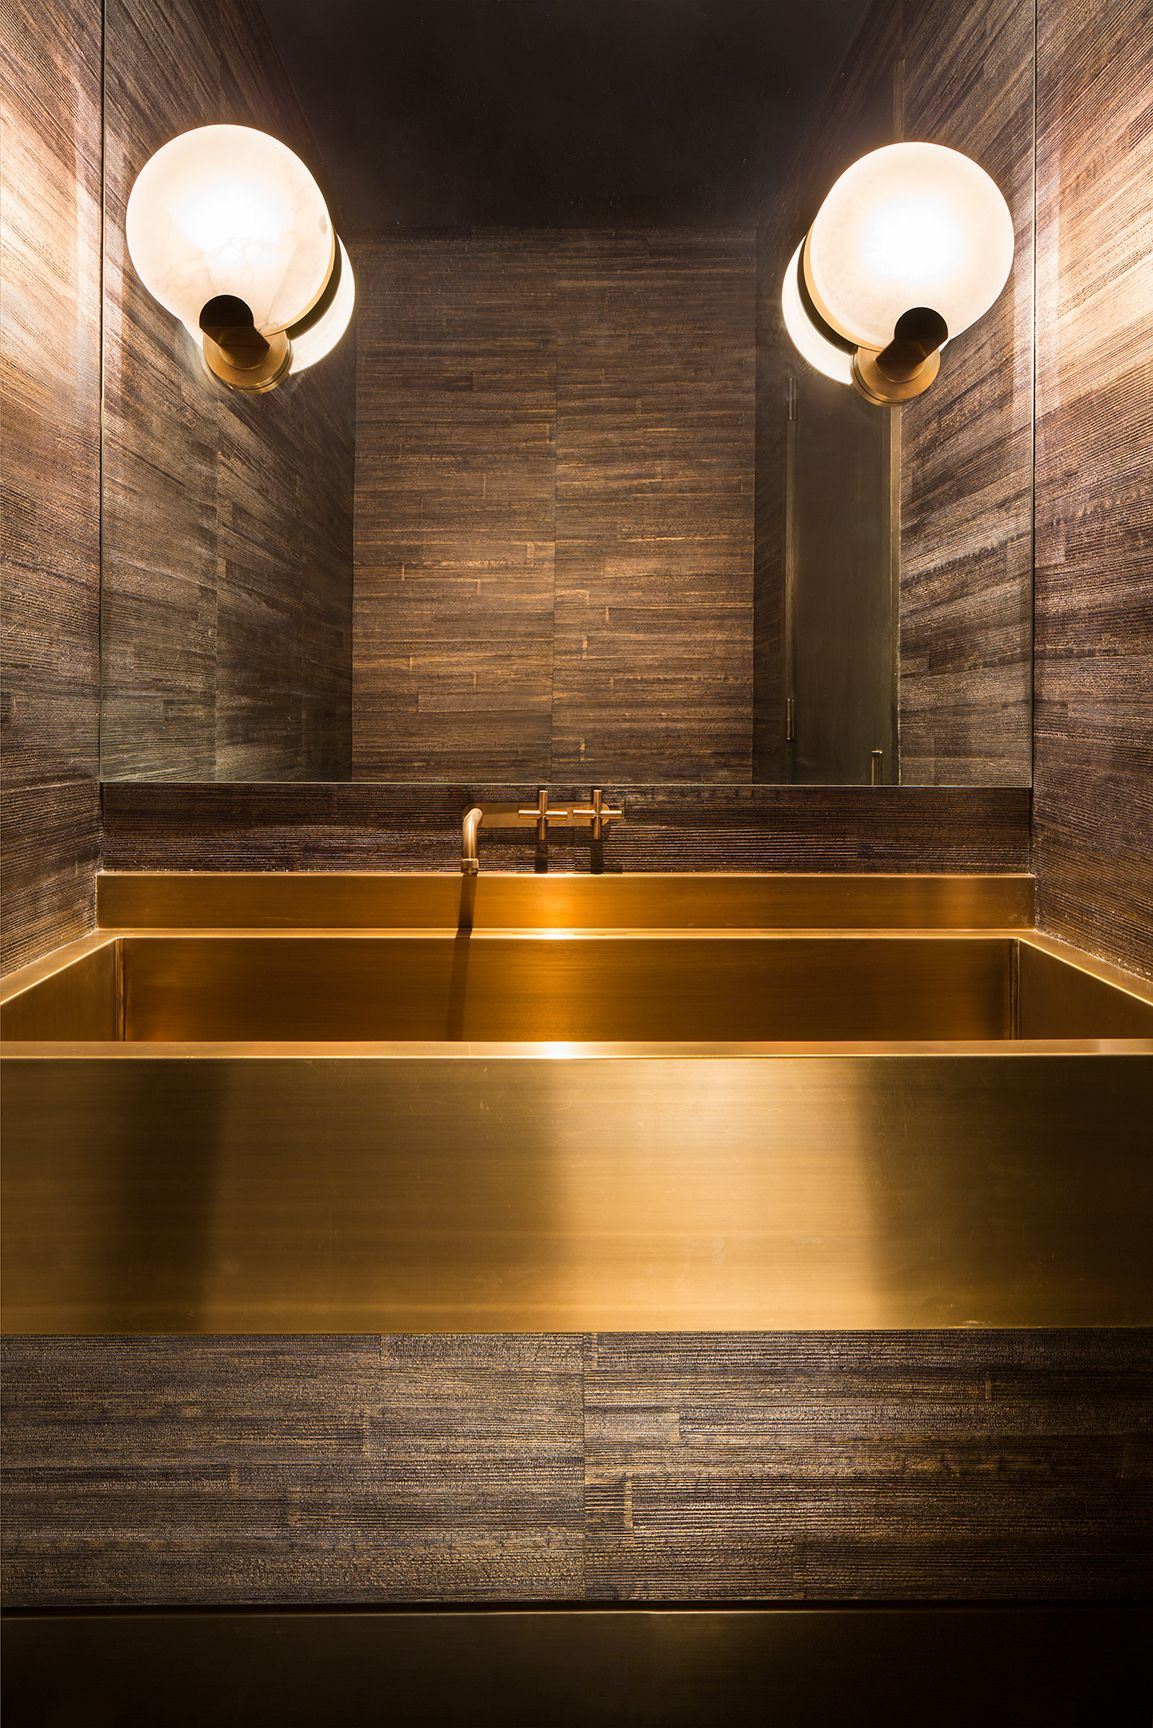 Pin By Binder Bern On The Griffith Residence Spa Bathroom Design Beautiful Bathrooms Bathroom Interior Design